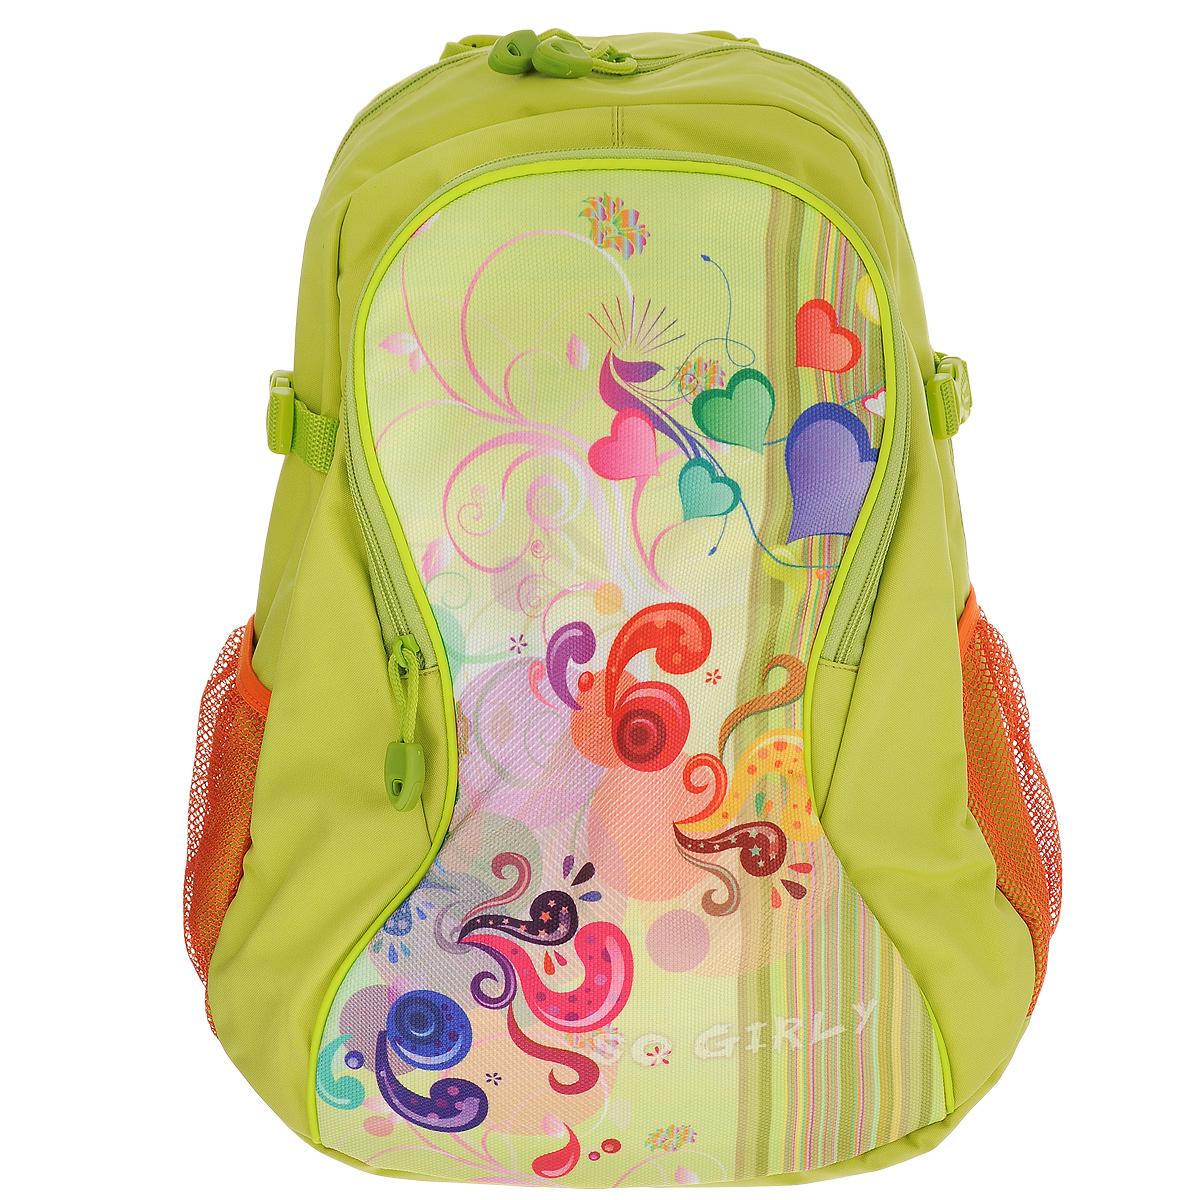 Tiger Family Рюкзак детский Atiu цвет зеленый tiger enterprise рюкзак детский atiu цвет зеленый